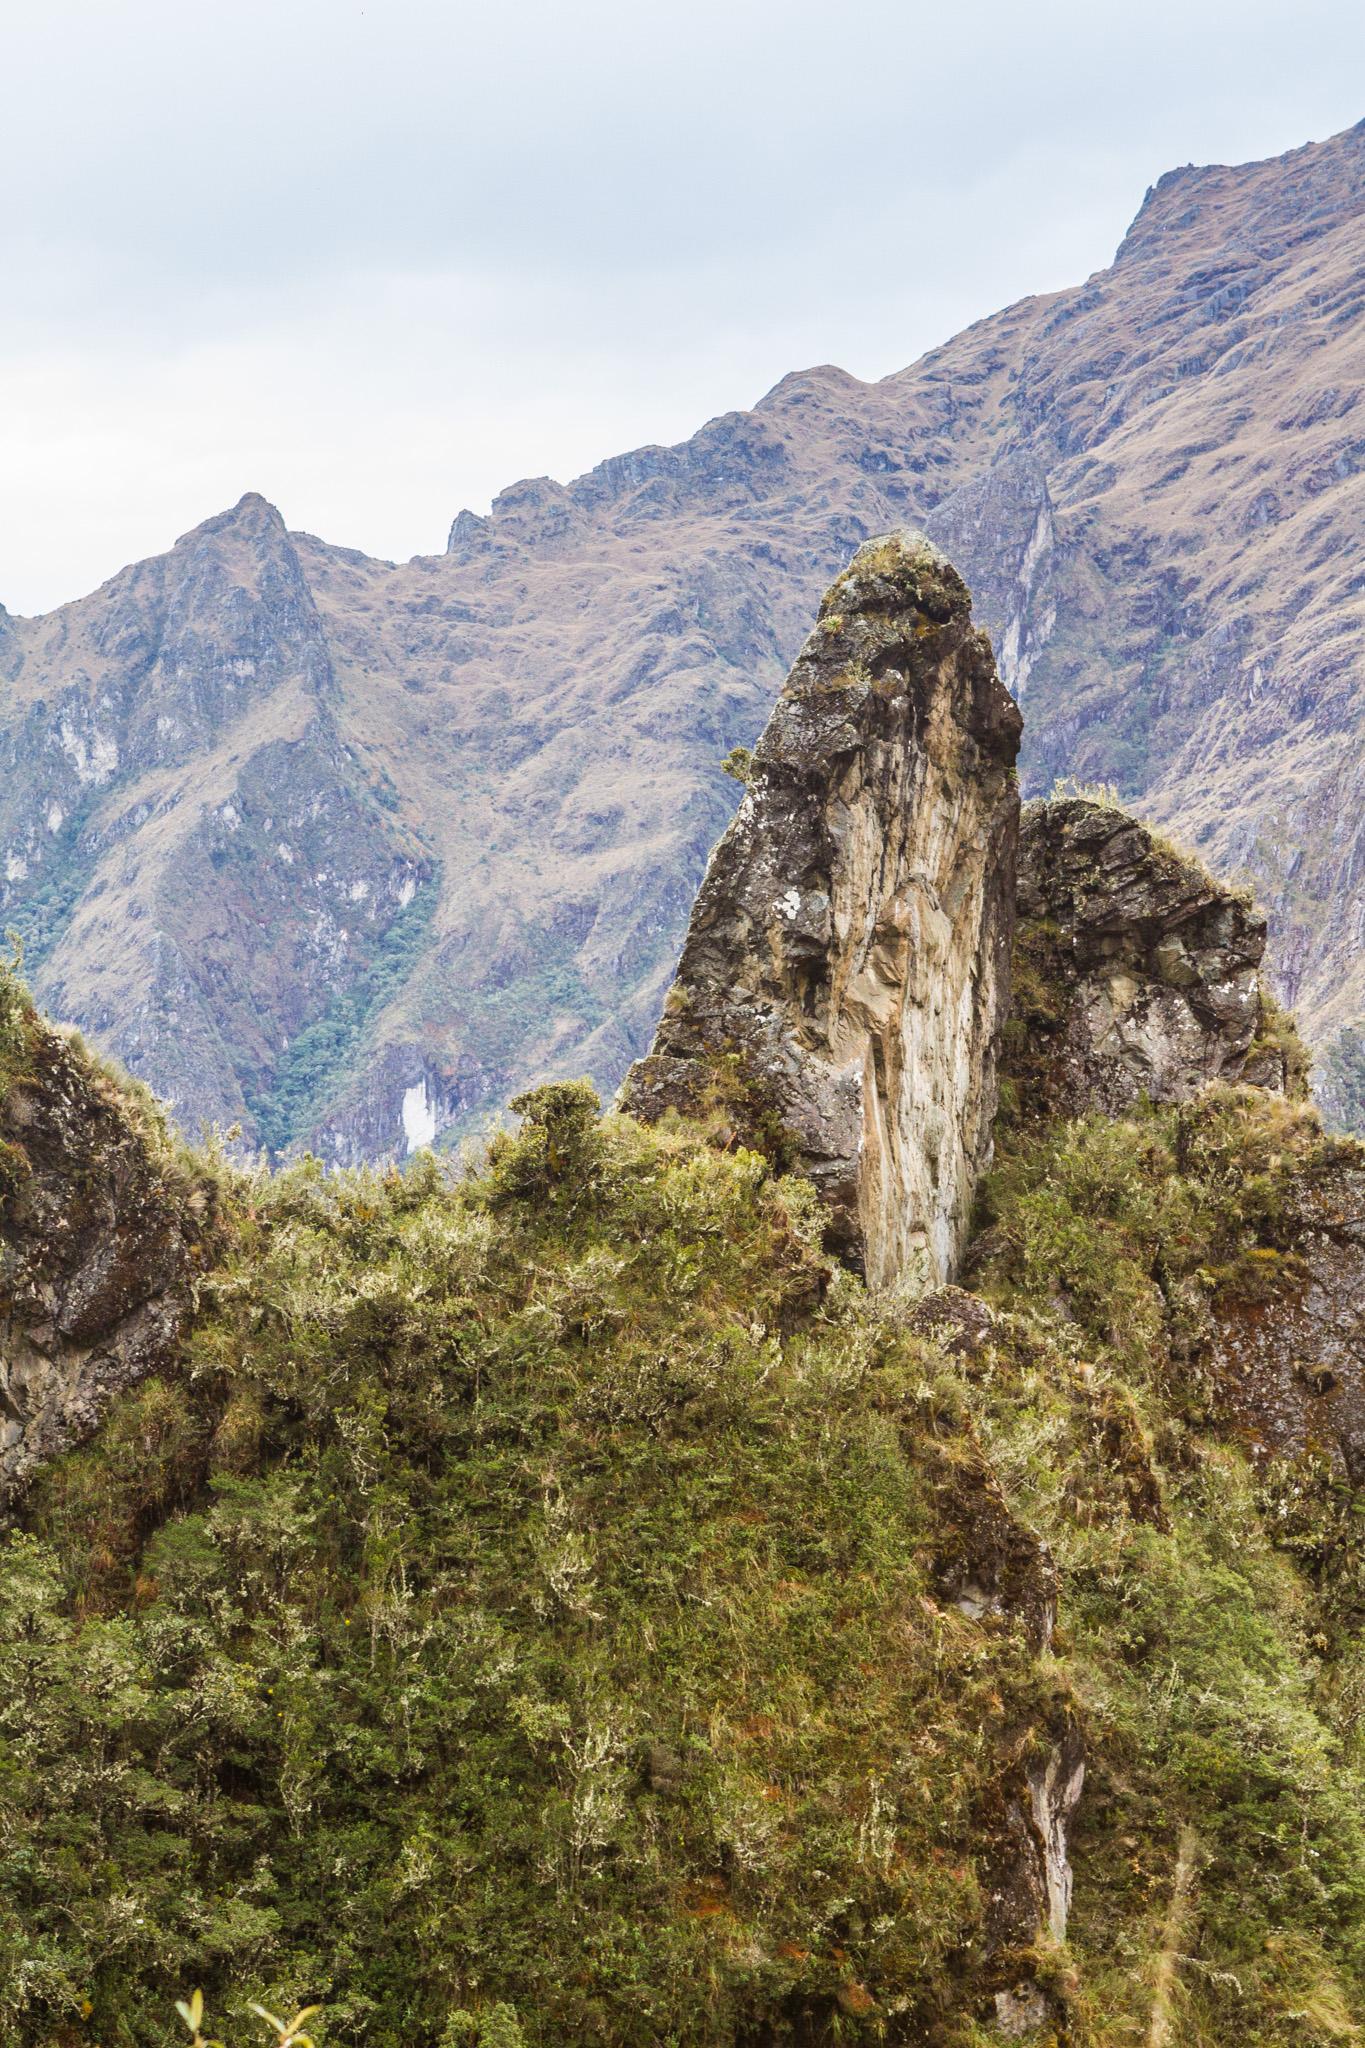 Ali-Barqawi-Studios-Explore-Series-Travel-Adventure-Documentary-C4CGAZA-Peru-MachuPicchu-2015-194.jpg